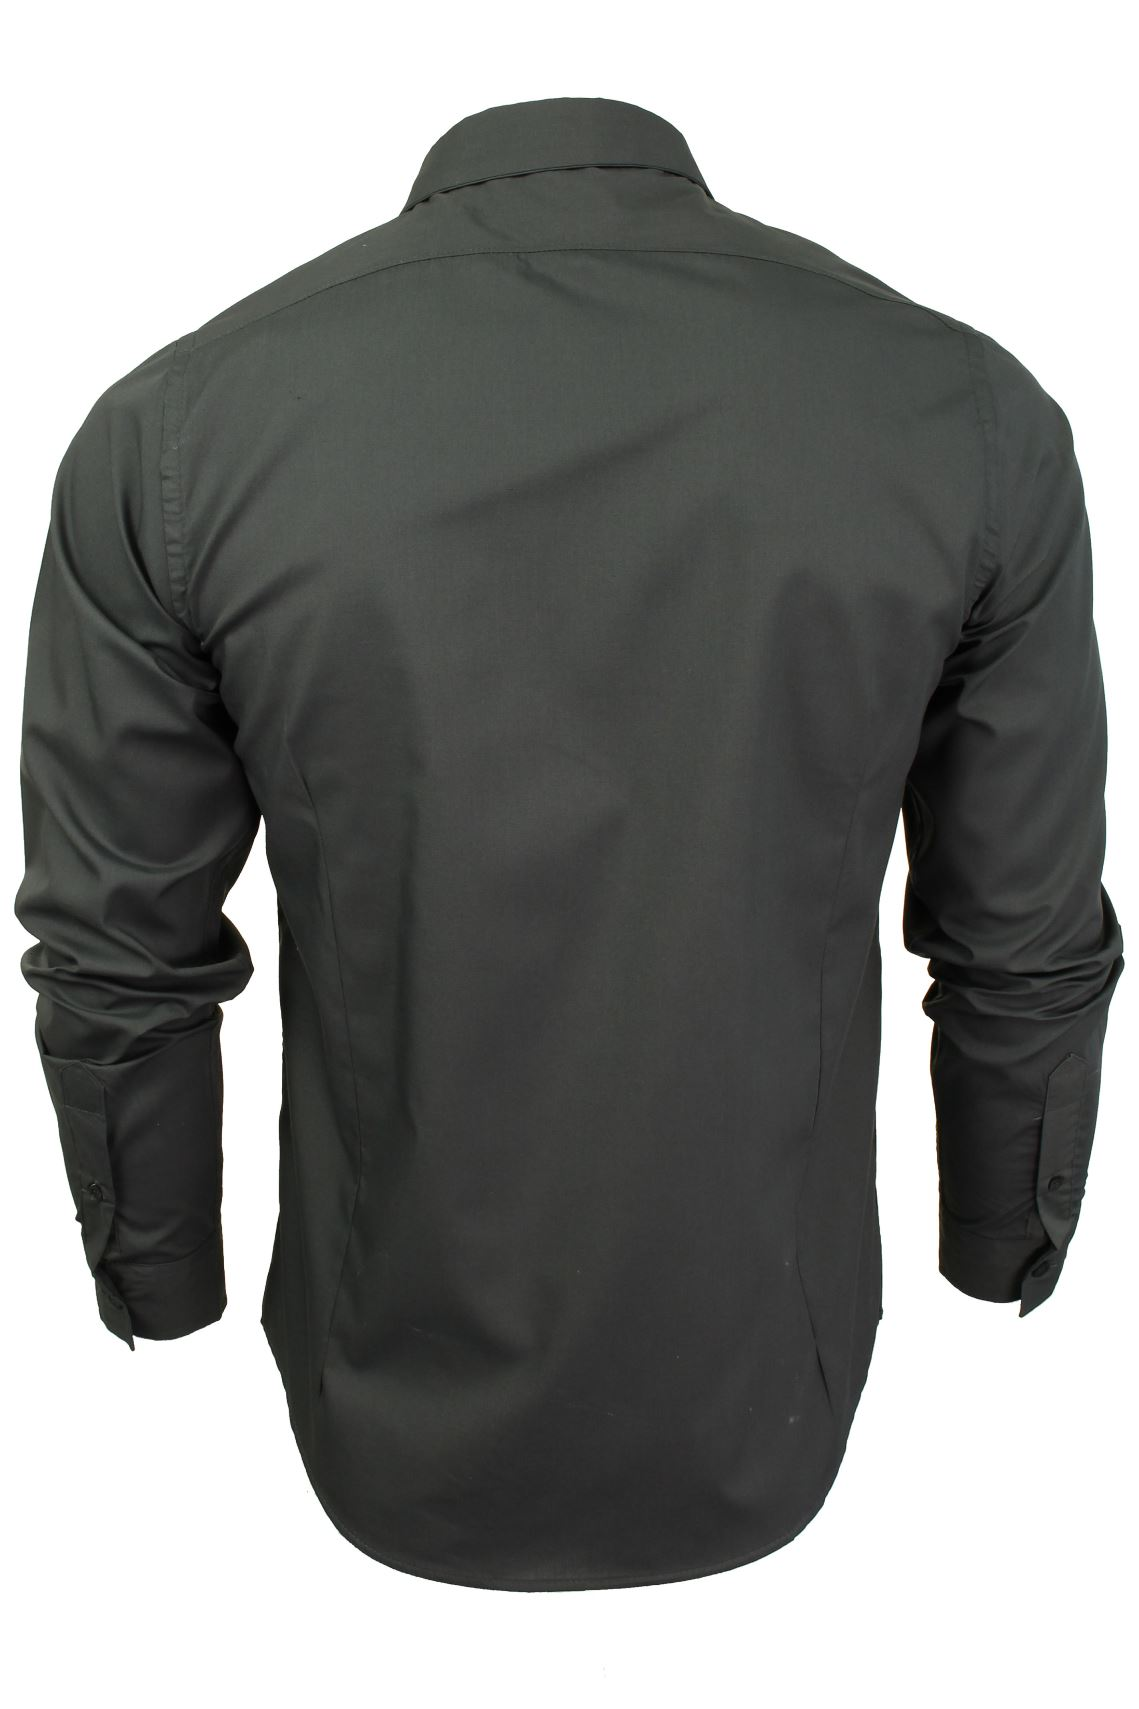 Mens-Plain-Shirt-by-Brave-Soul-039-Tudor-039-Long-Sleeved thumbnail 8